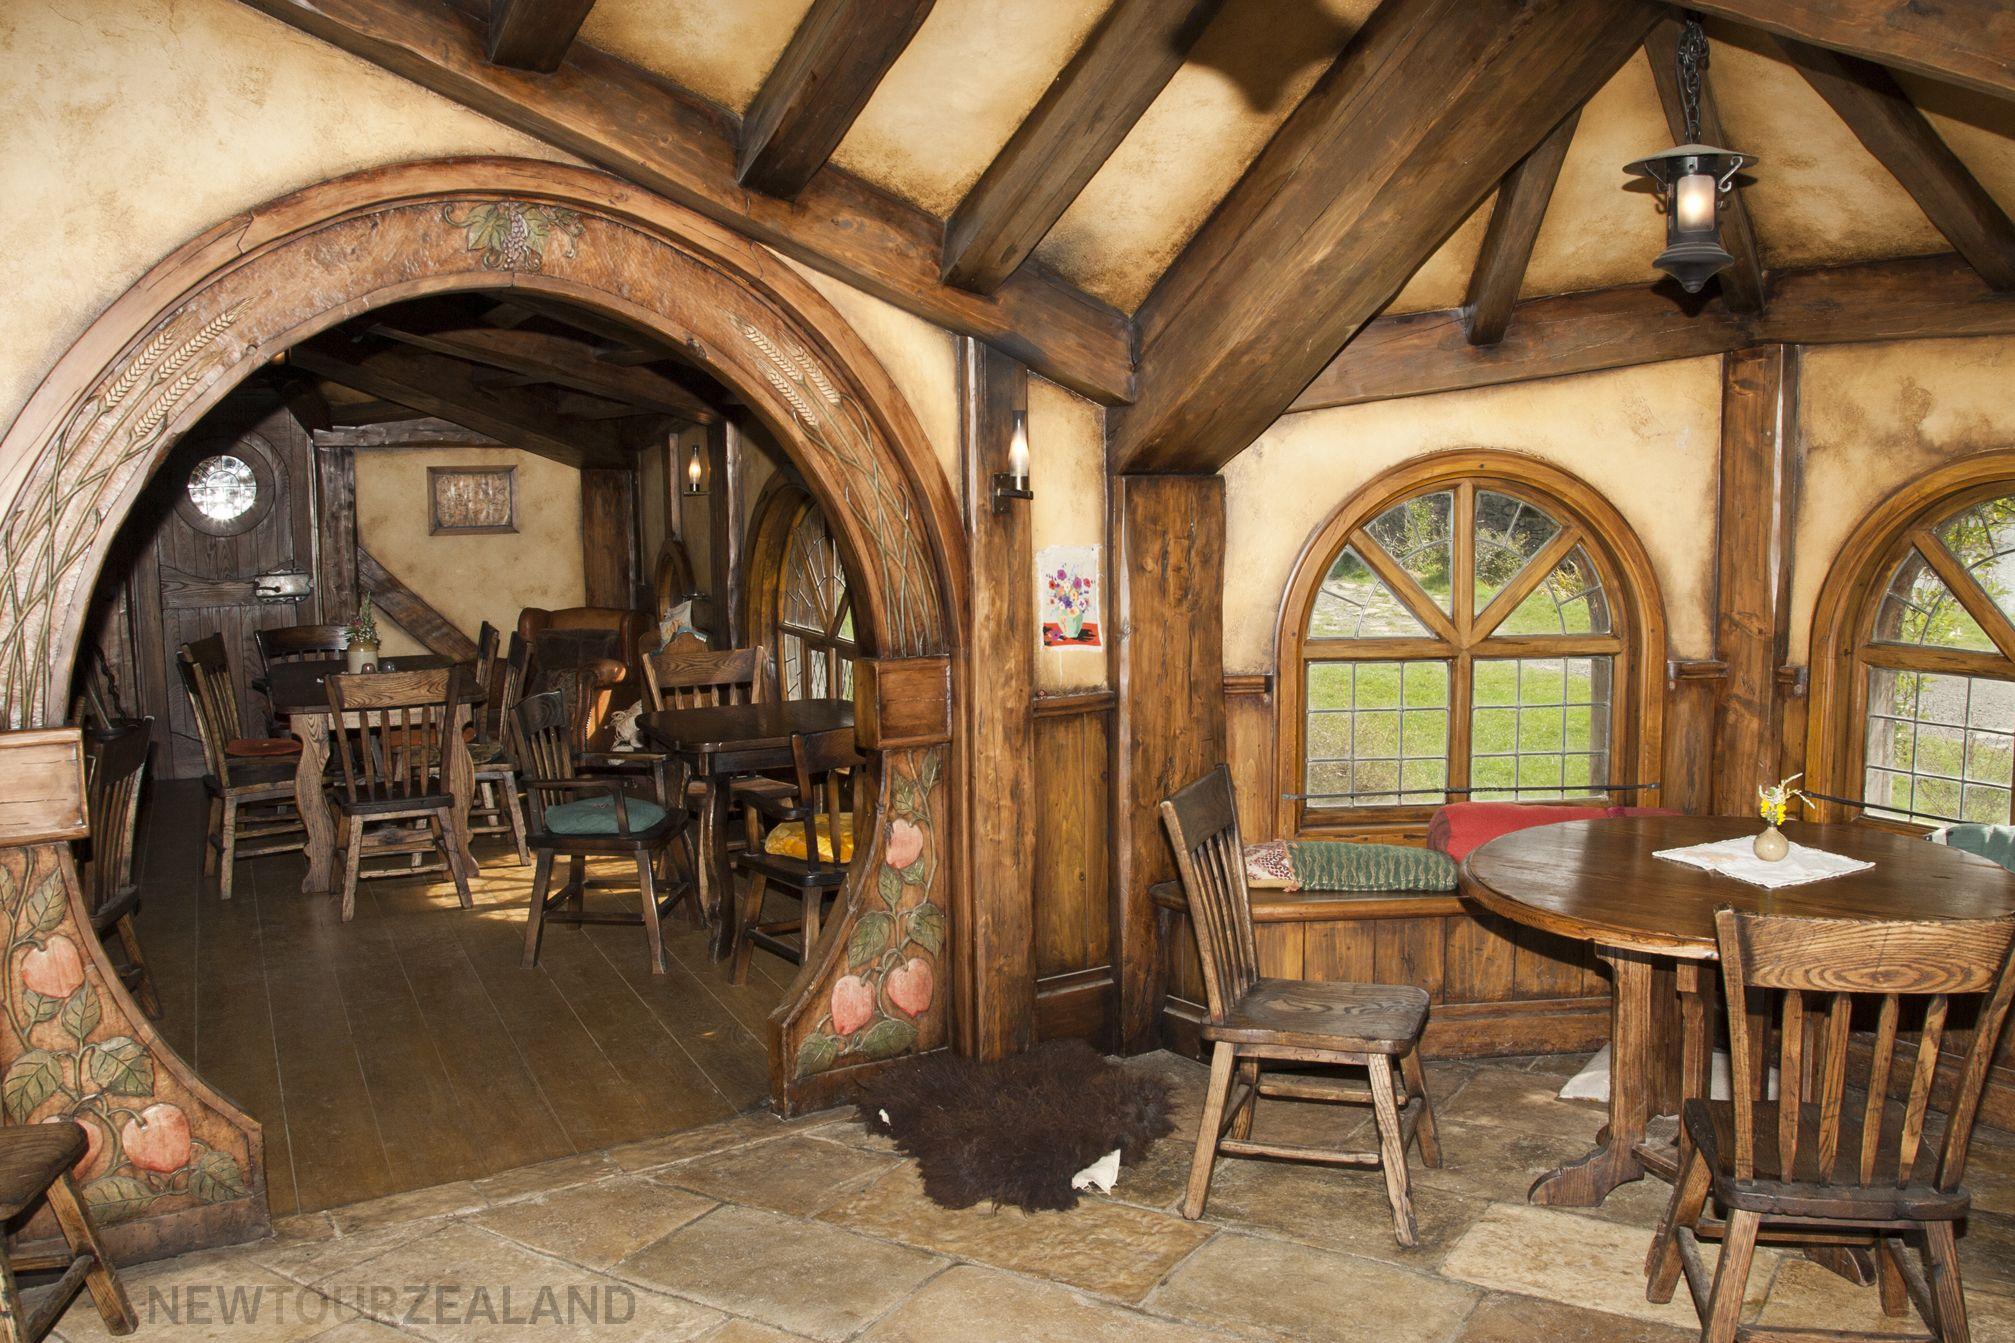 Hobbit Homes For Sale